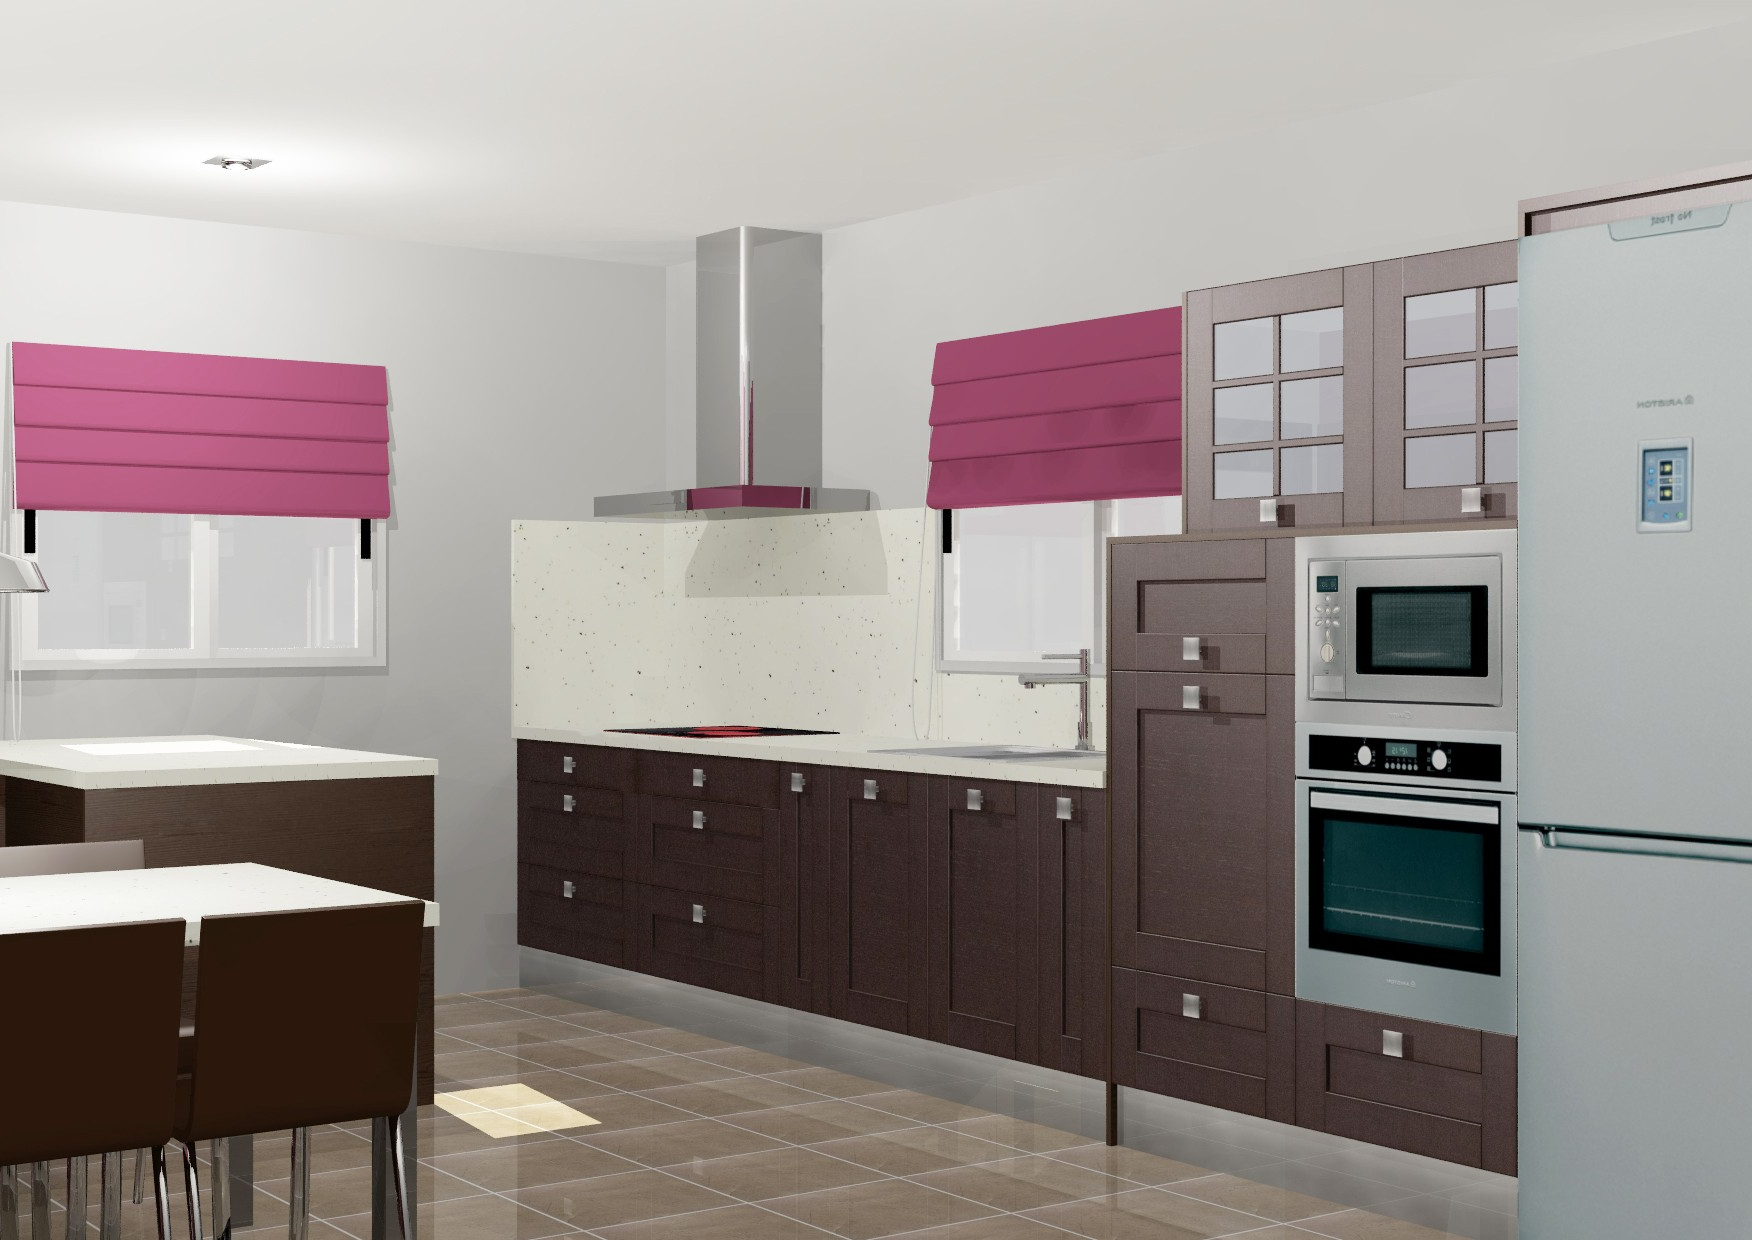 Comprar Muebles De Cocina E9dx Muebles De Cocina Baratos Online Prar ...